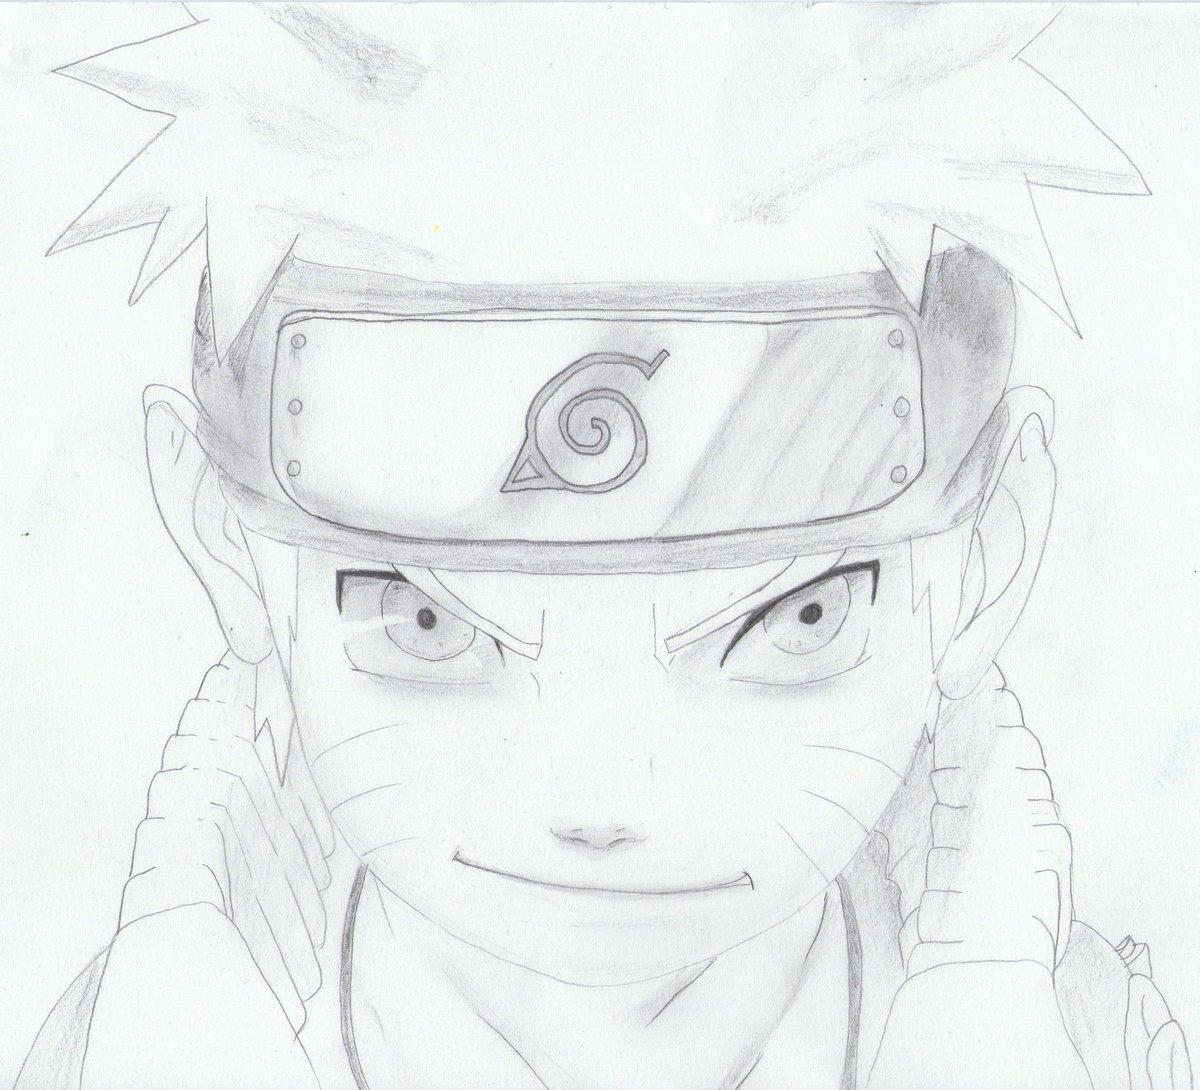 #drawing #anime #naruto #pencildrawing #traditionalartpic.twitter.com/RfFfFXKCVD